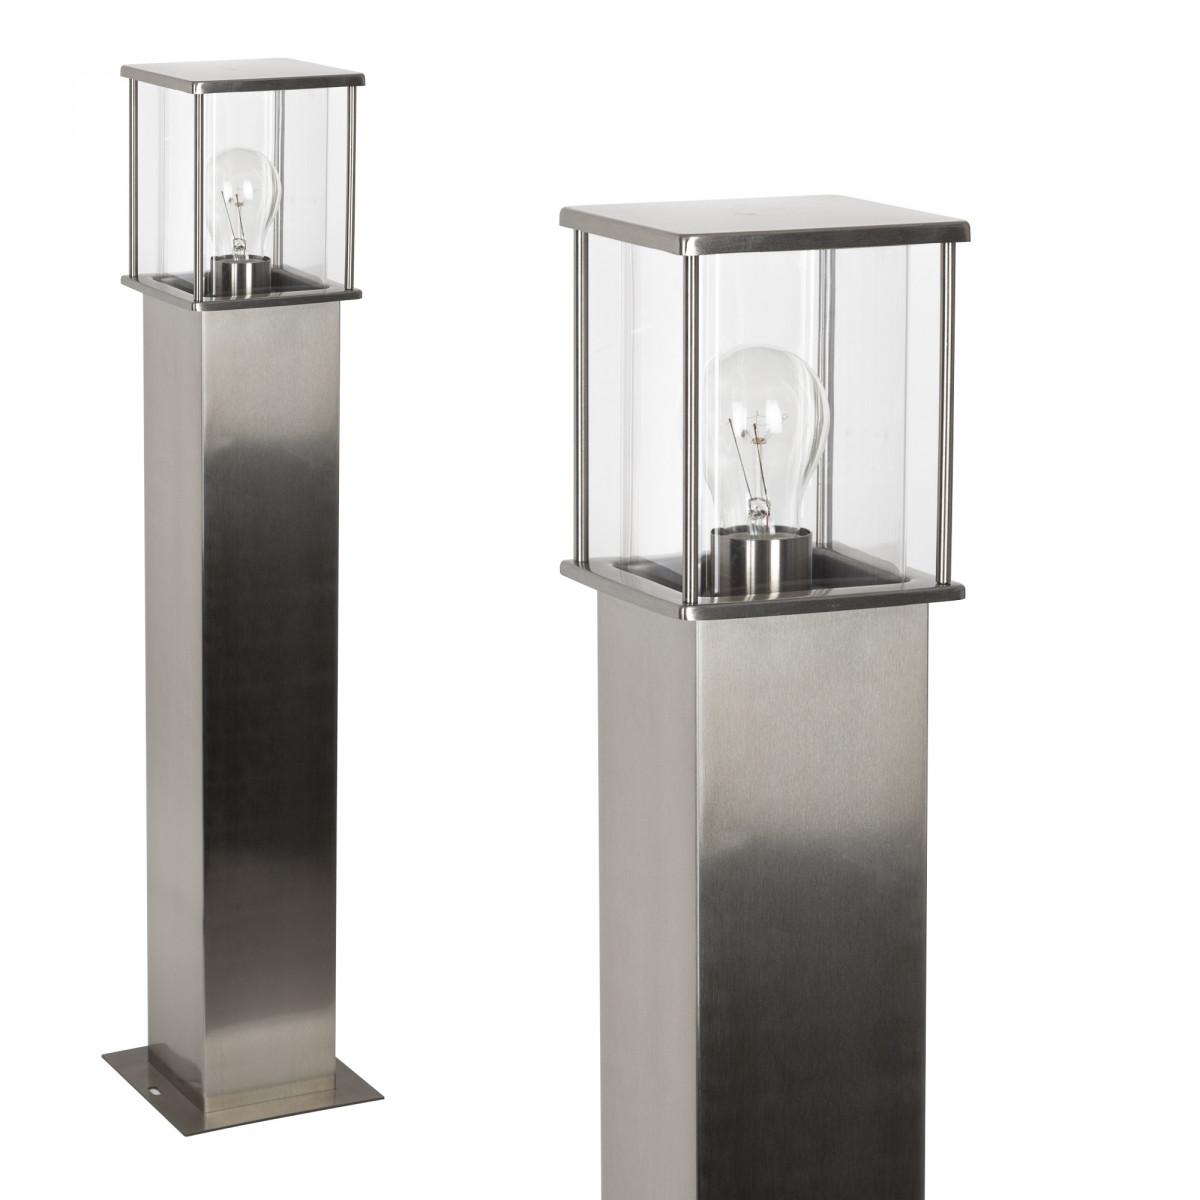 rvs tuinlamp, staande buitenverlichting, vierkante paal met box design lantaarnkap, heldere beglazing, rondom lichtval, E27 fitting, 70cm hoog